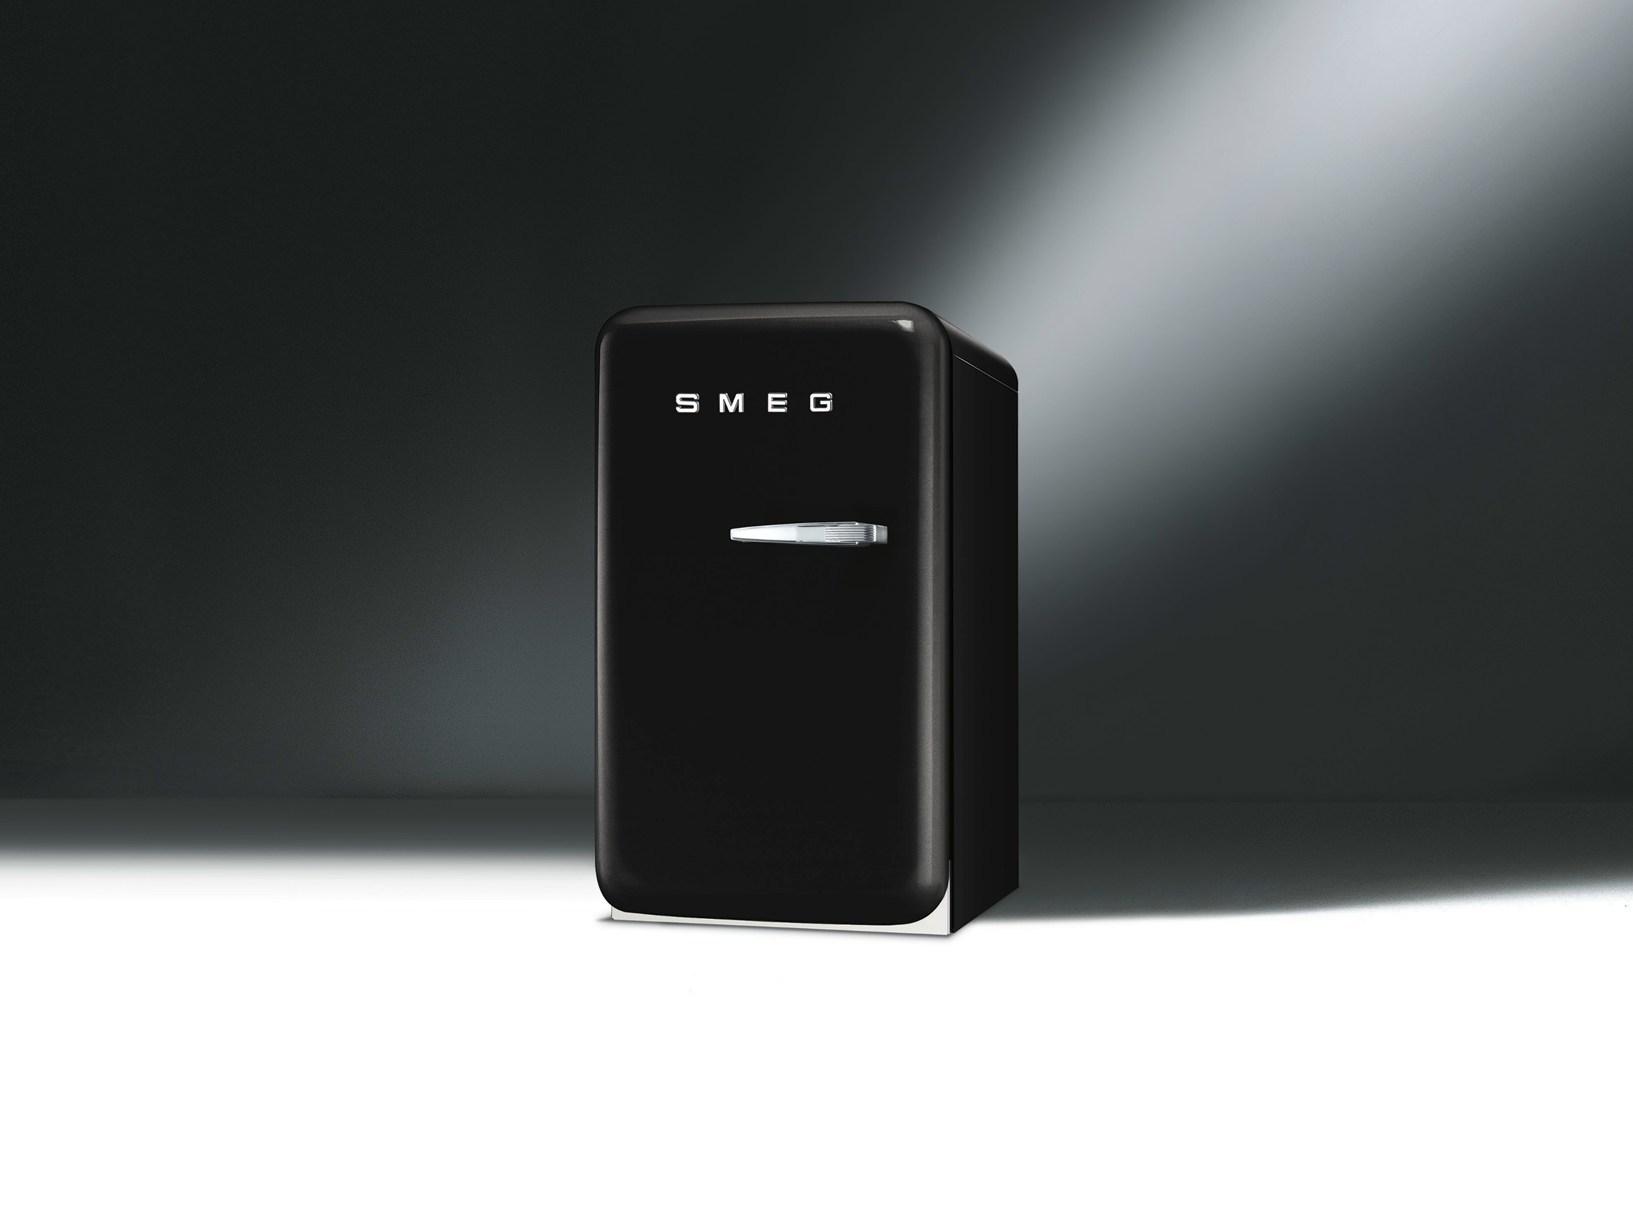 smeg presenta il nuovo mini frigo fab5. Black Bedroom Furniture Sets. Home Design Ideas